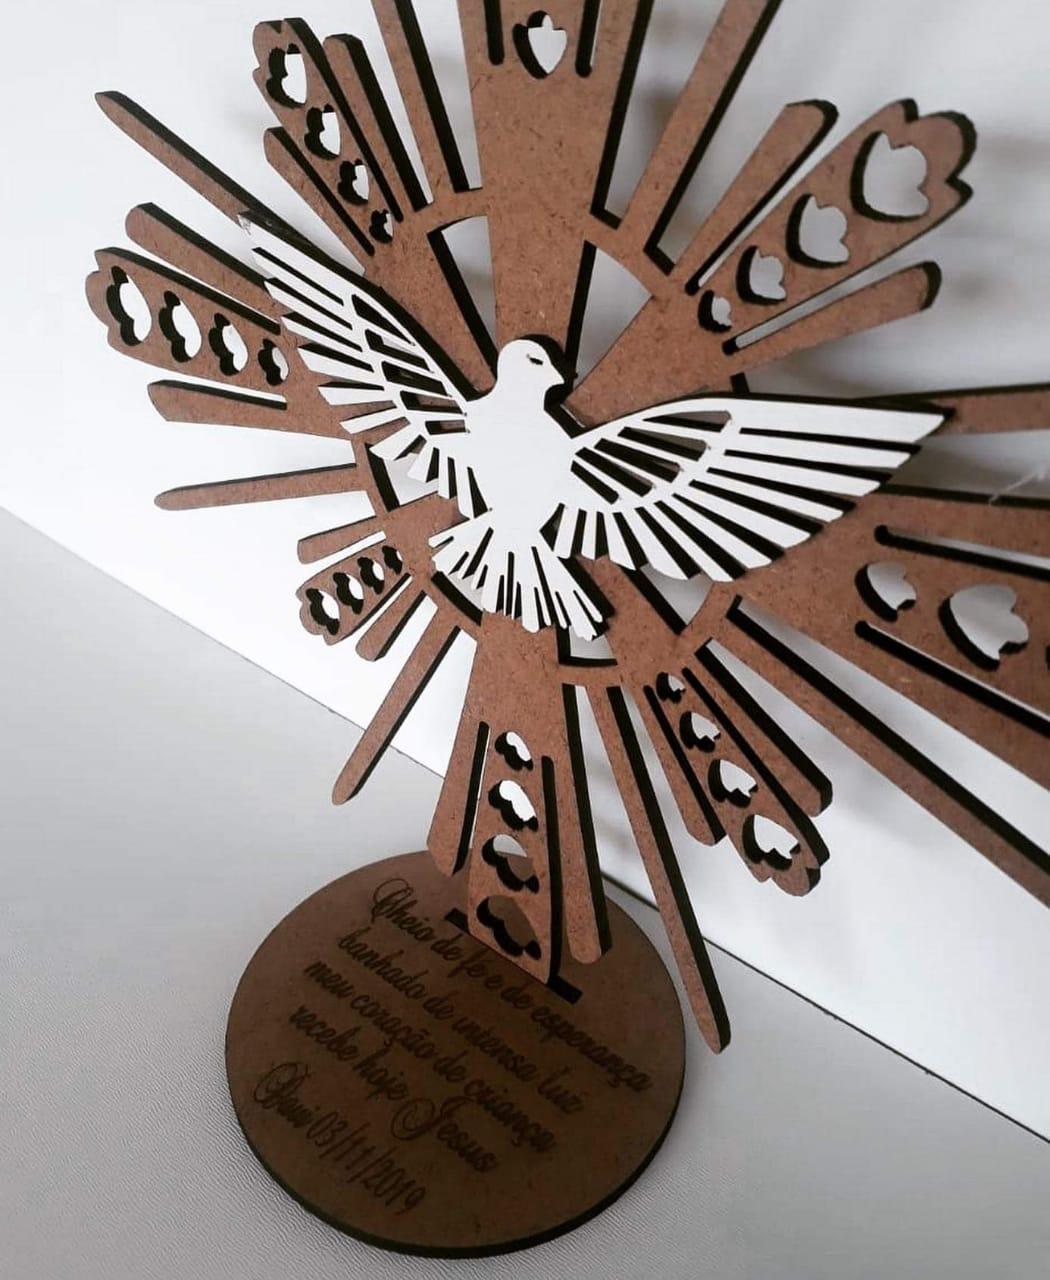 Kit centro de mesa  Divino Espirito santo  MDF cru 20 cm